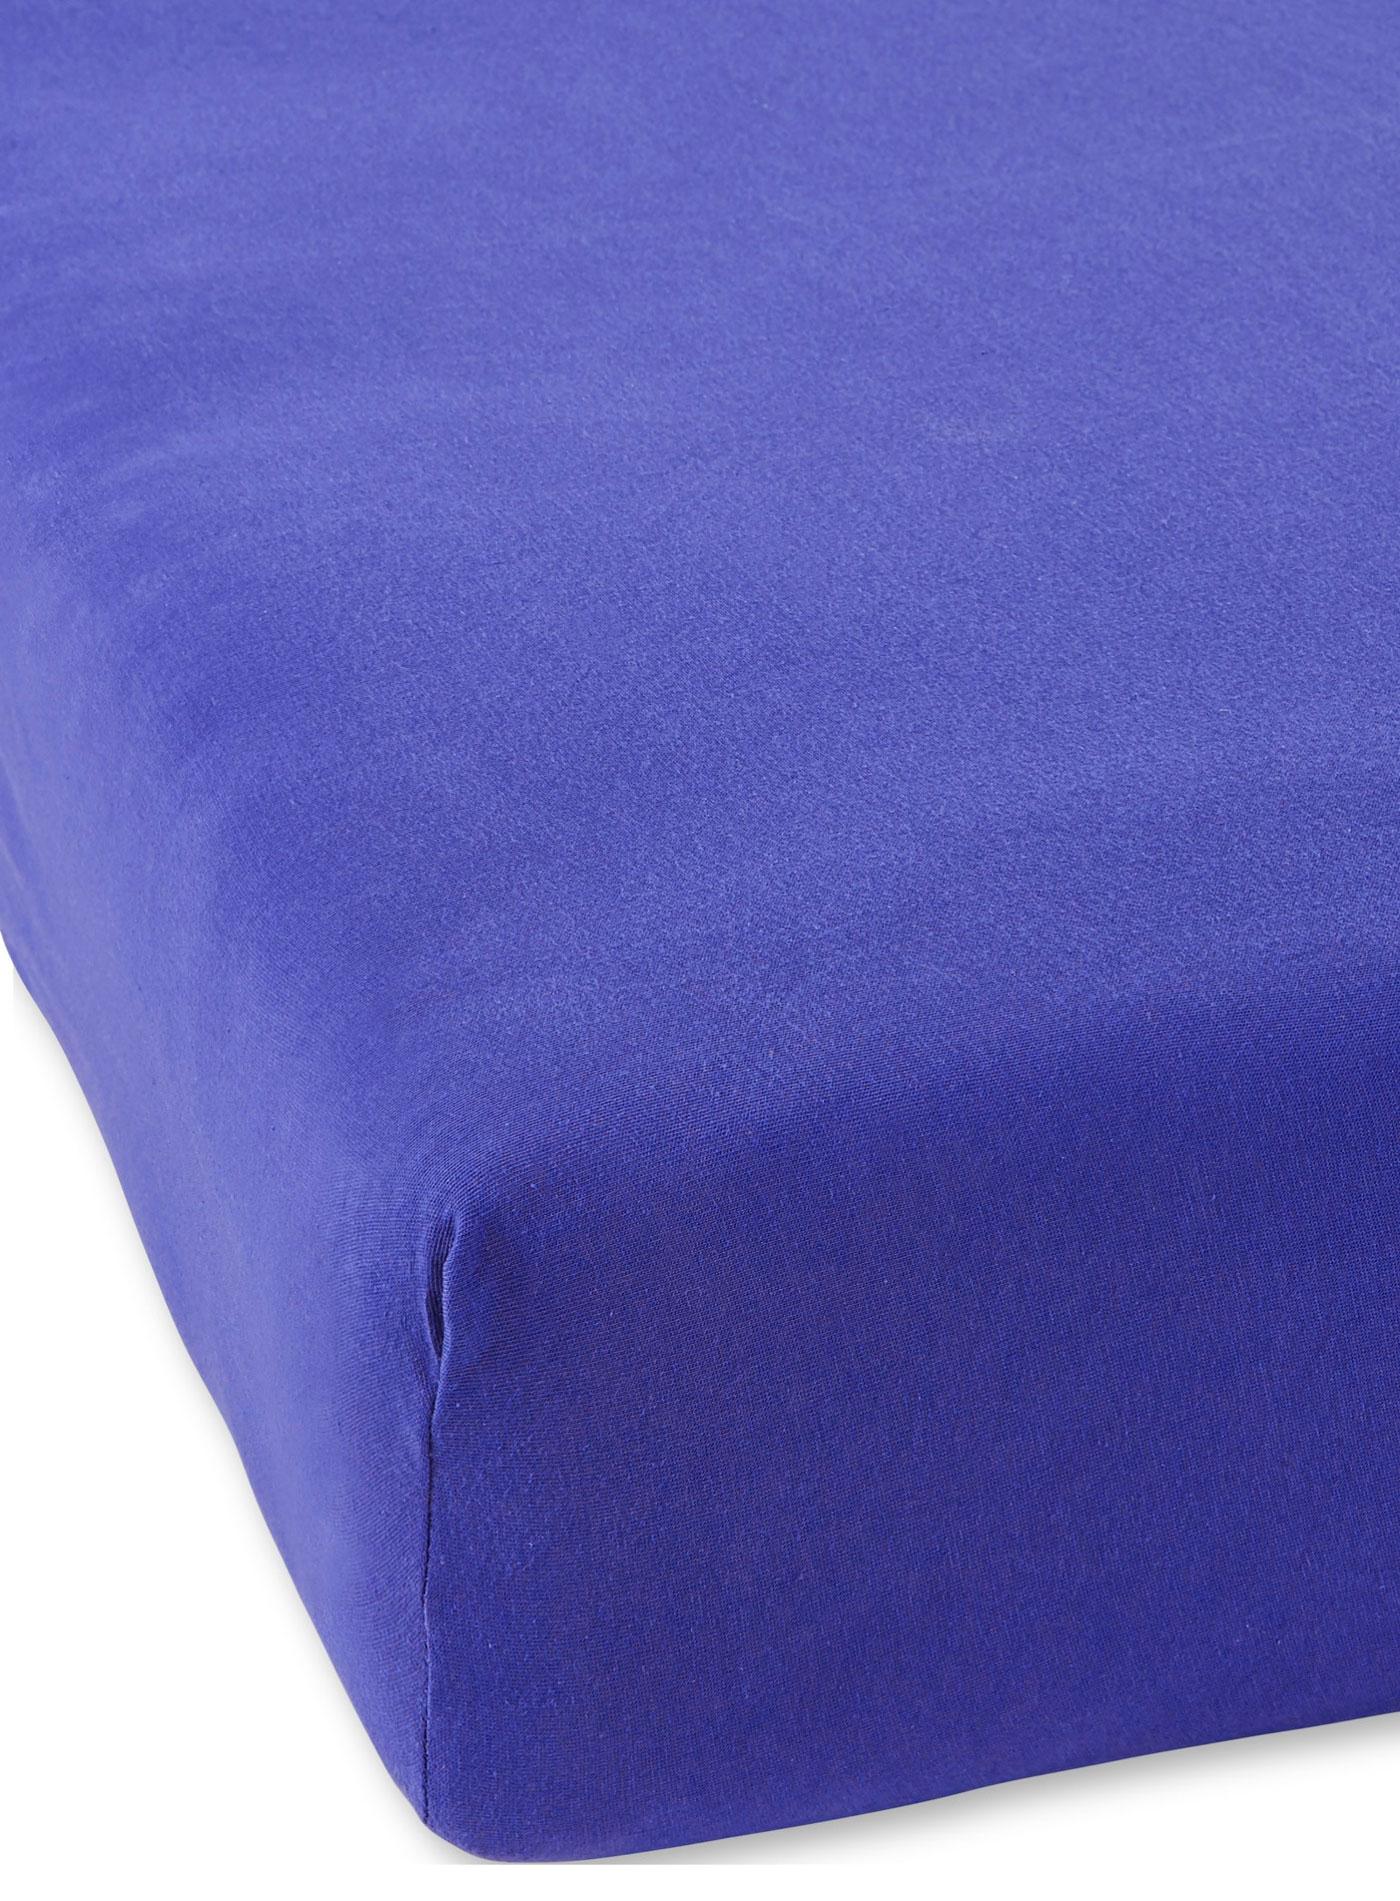 Простыня из трикотажа на резинке светло-синий Elin